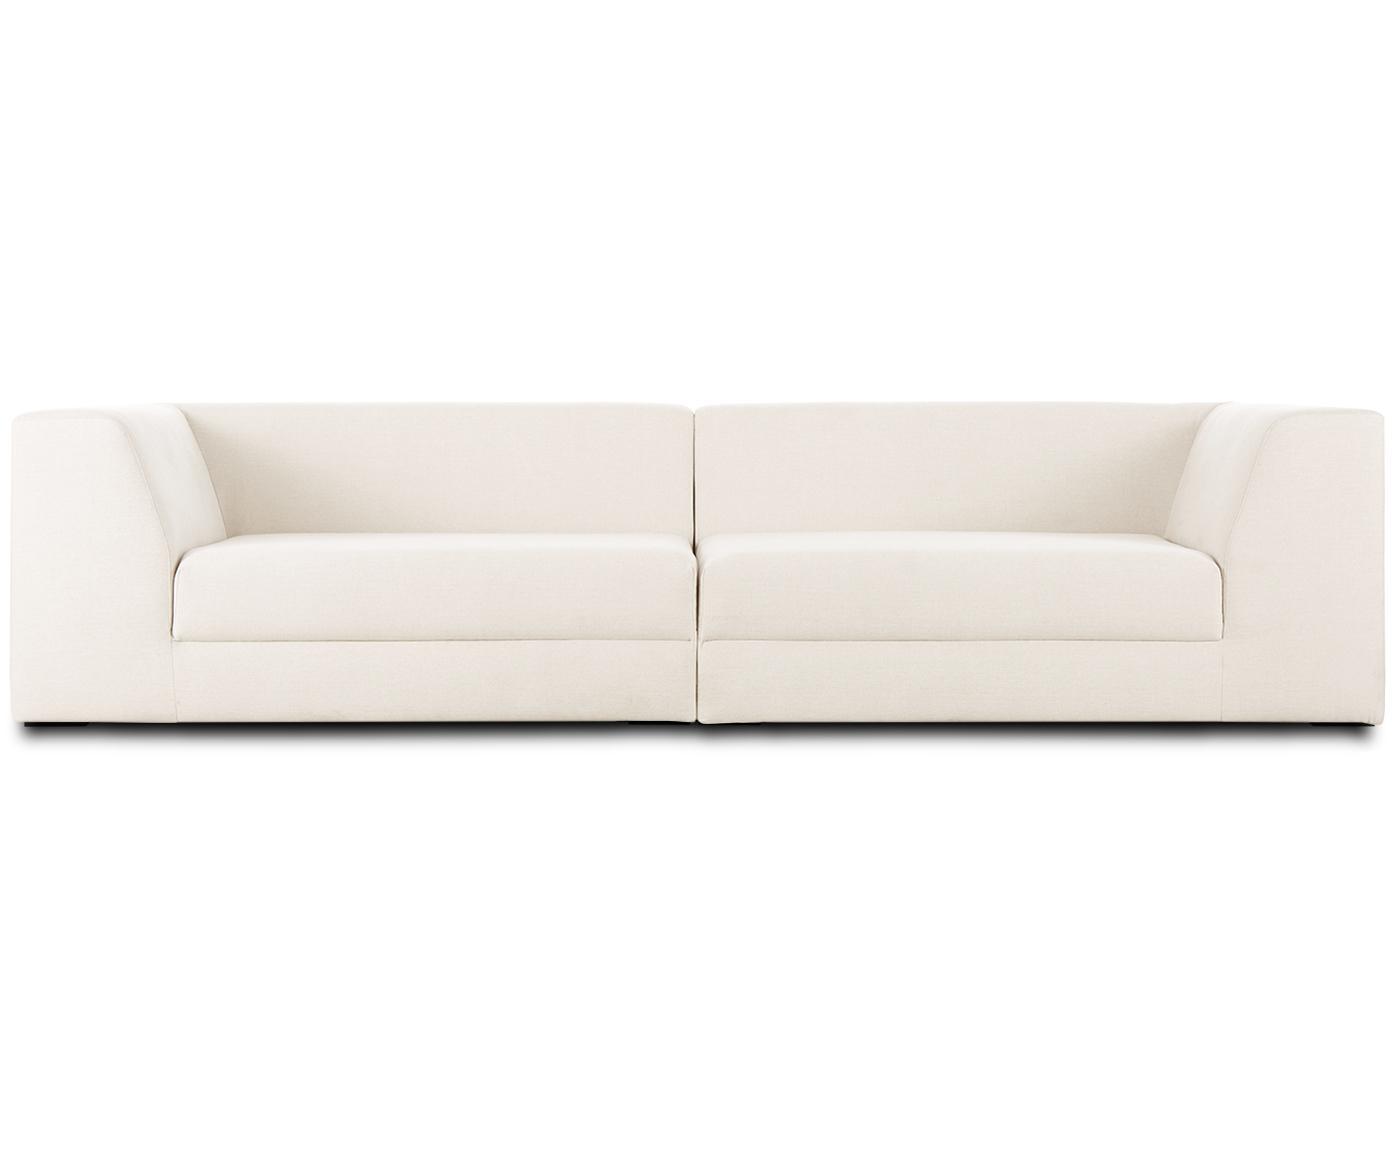 Modulares Sofa Grant (3-Sitzer), Bezug: Baumwolle 20.000 Scheuert, Gestell: Fichtenholz, Füße: Massives Buchenholz, lack, Webstoff Beige, B 266 x T 106 cm